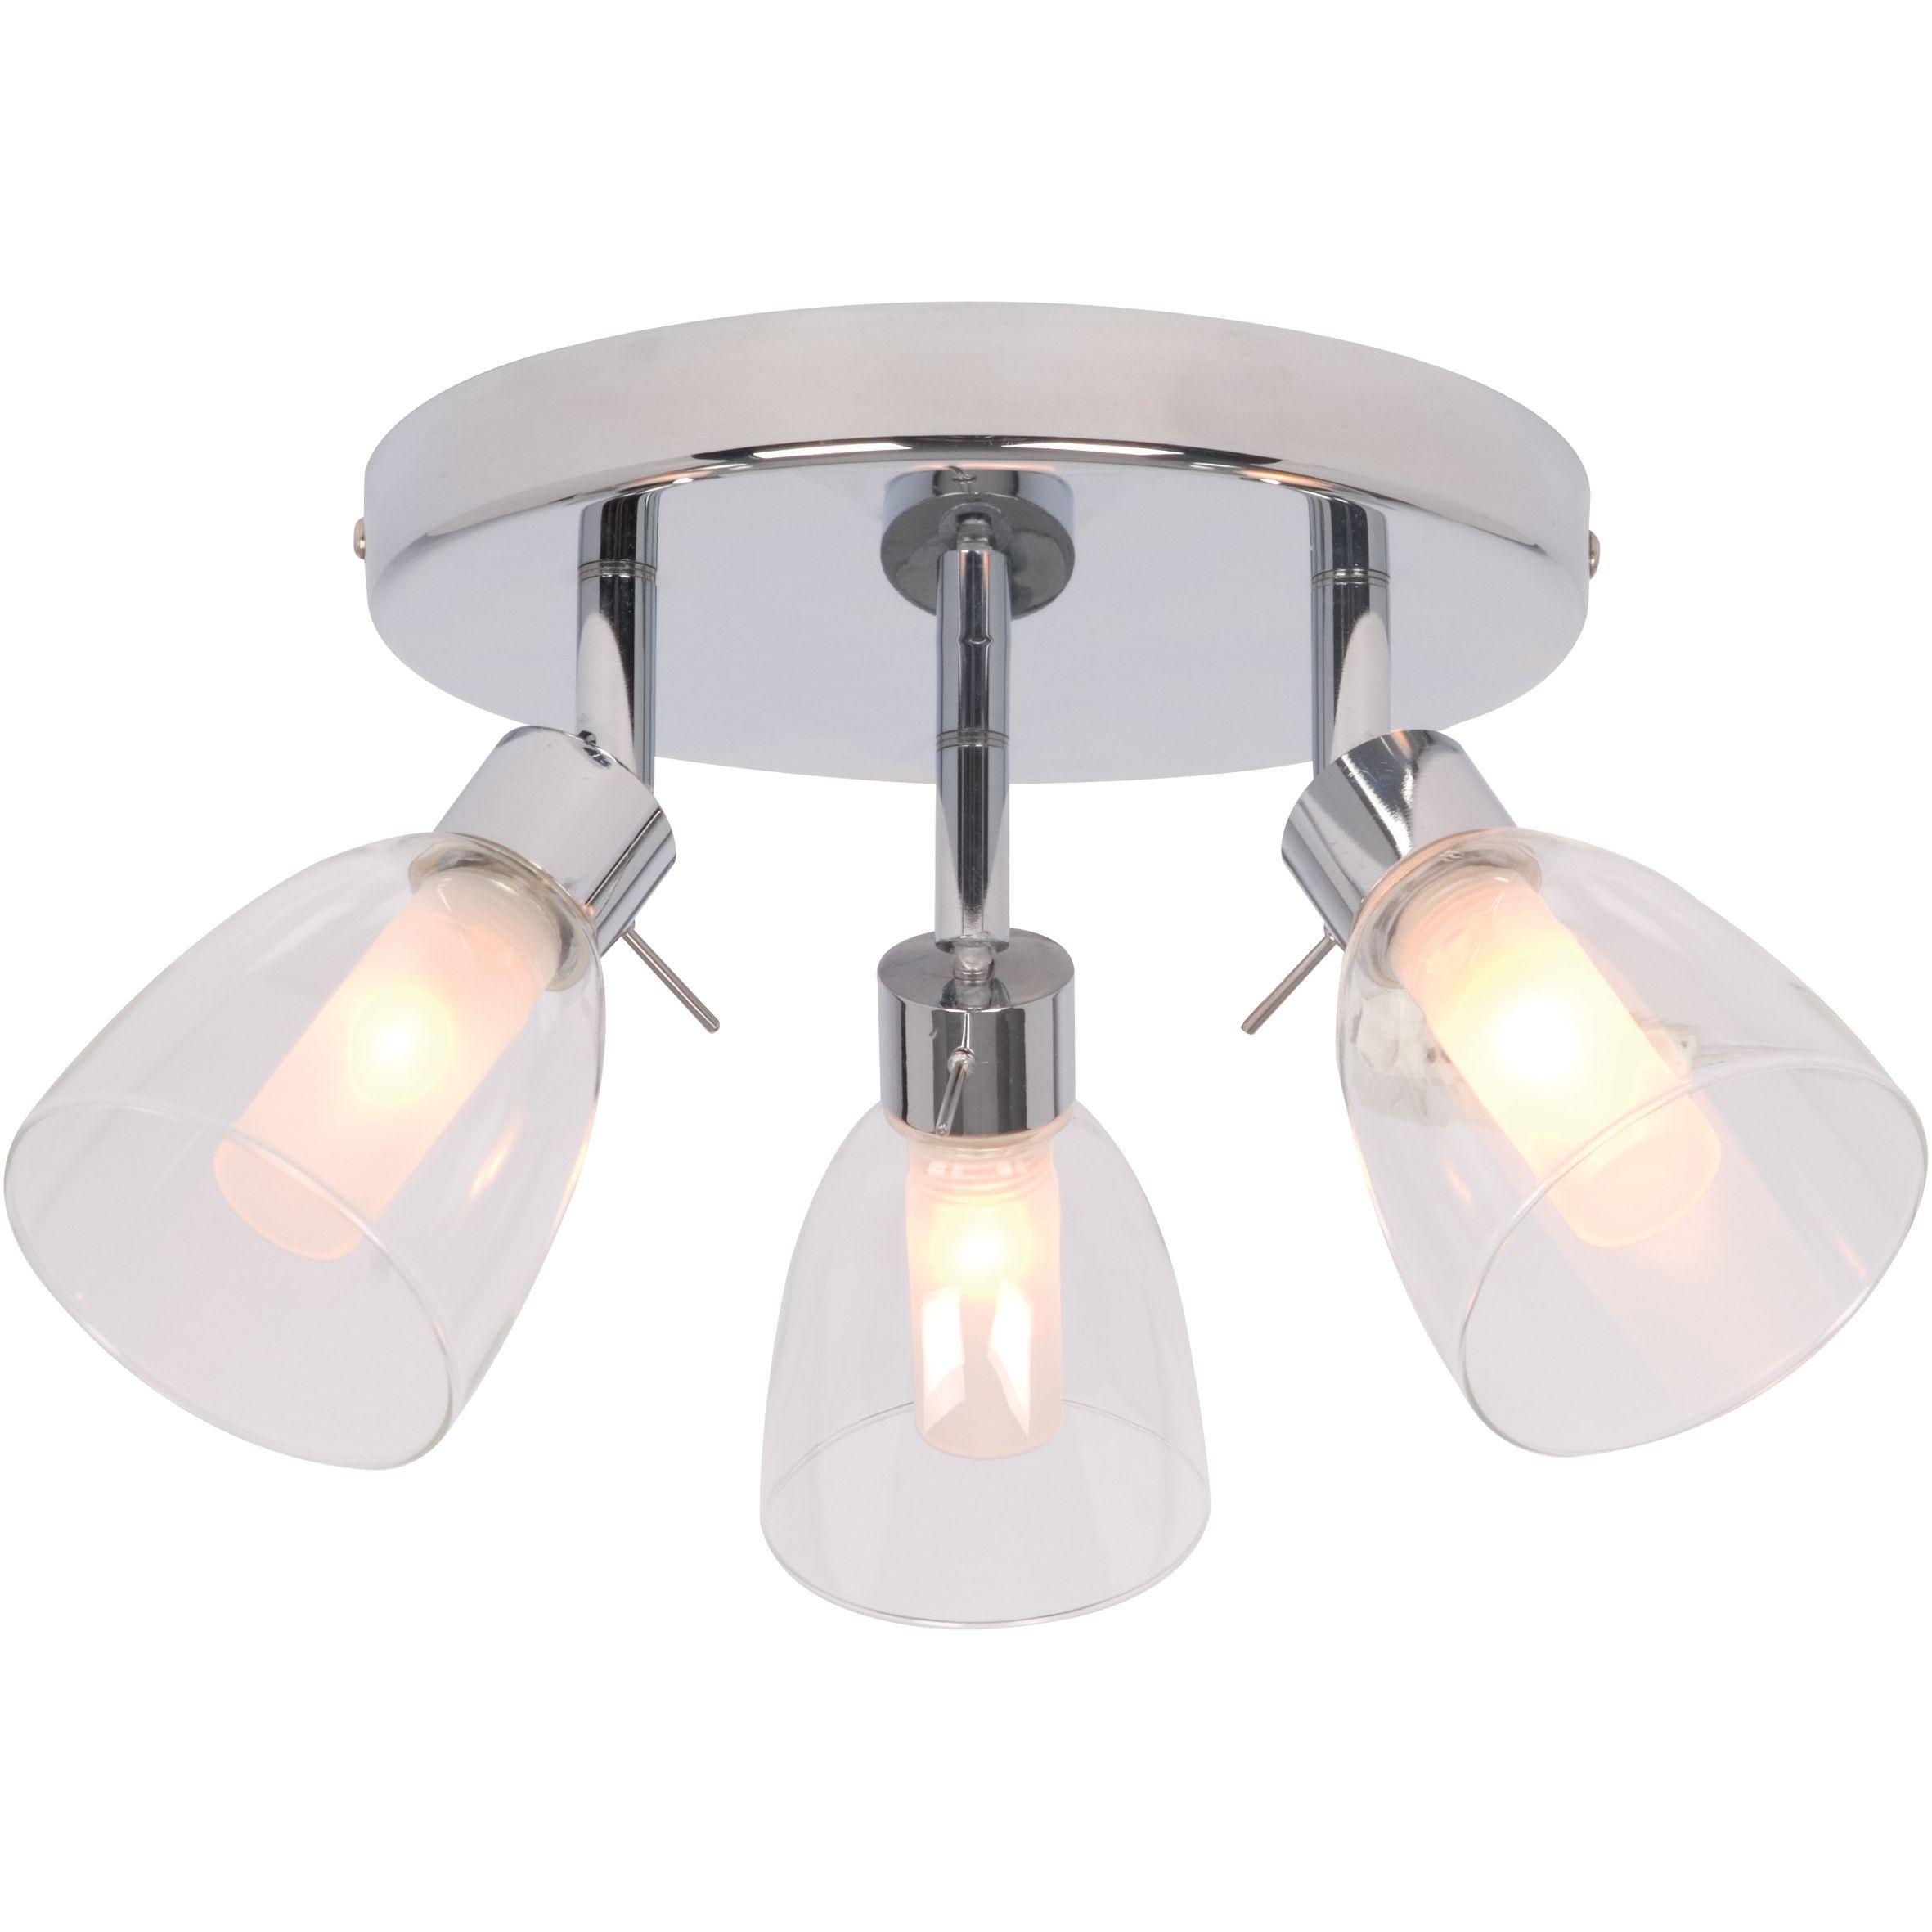 Geni Chrome-Plated 3 Lamp Bathroom Spotlight | Bathroom spotlights ...